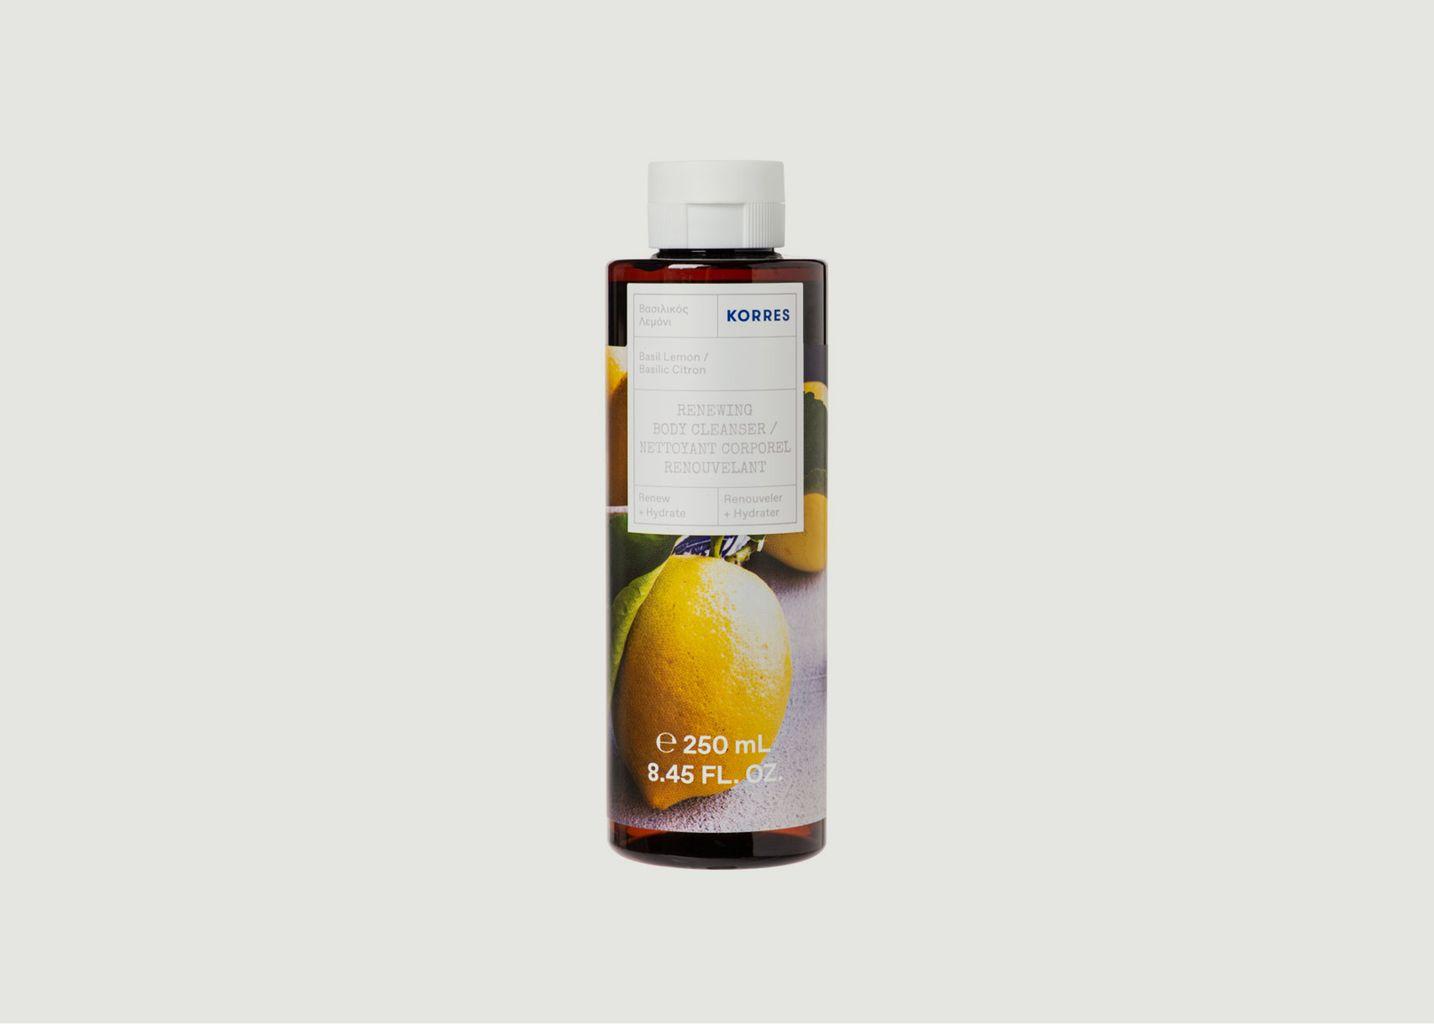 Gel douche basilic citron 250ml - Korres